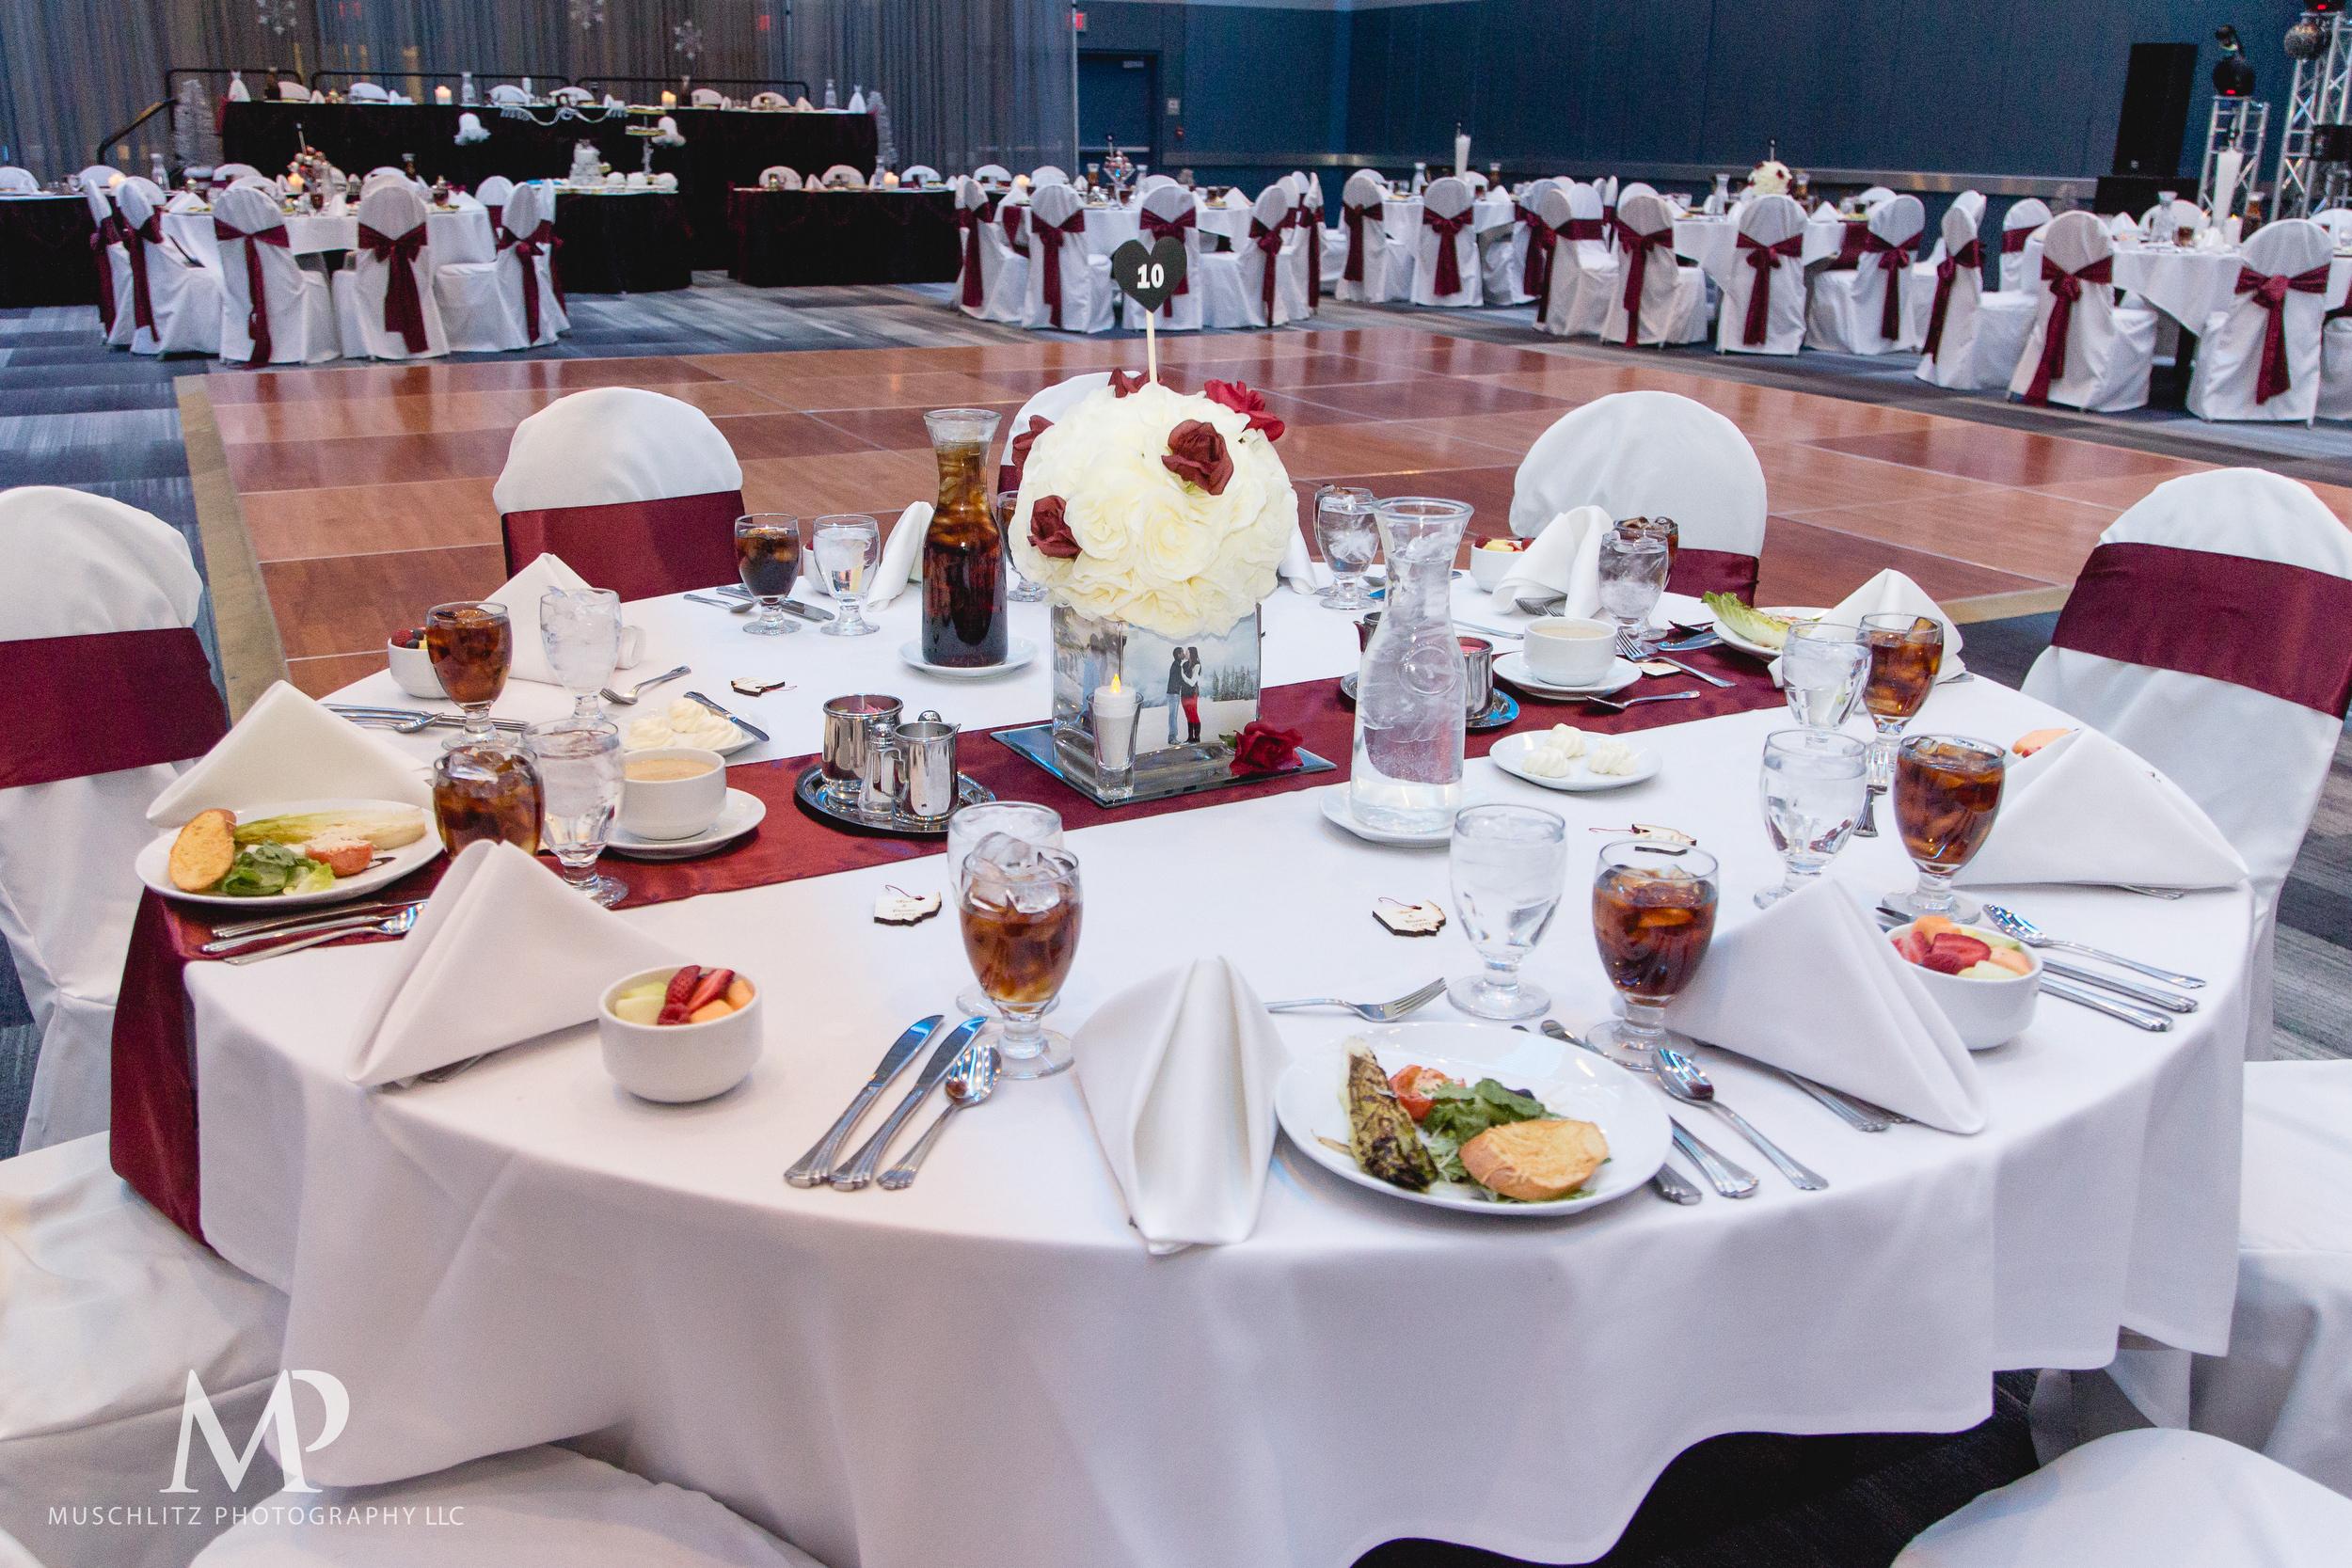 greater-columbus-convention-center-winter-wedding-ceremony-reception-portraits-columbus-ohio-muschlitz-photography-064.JPG